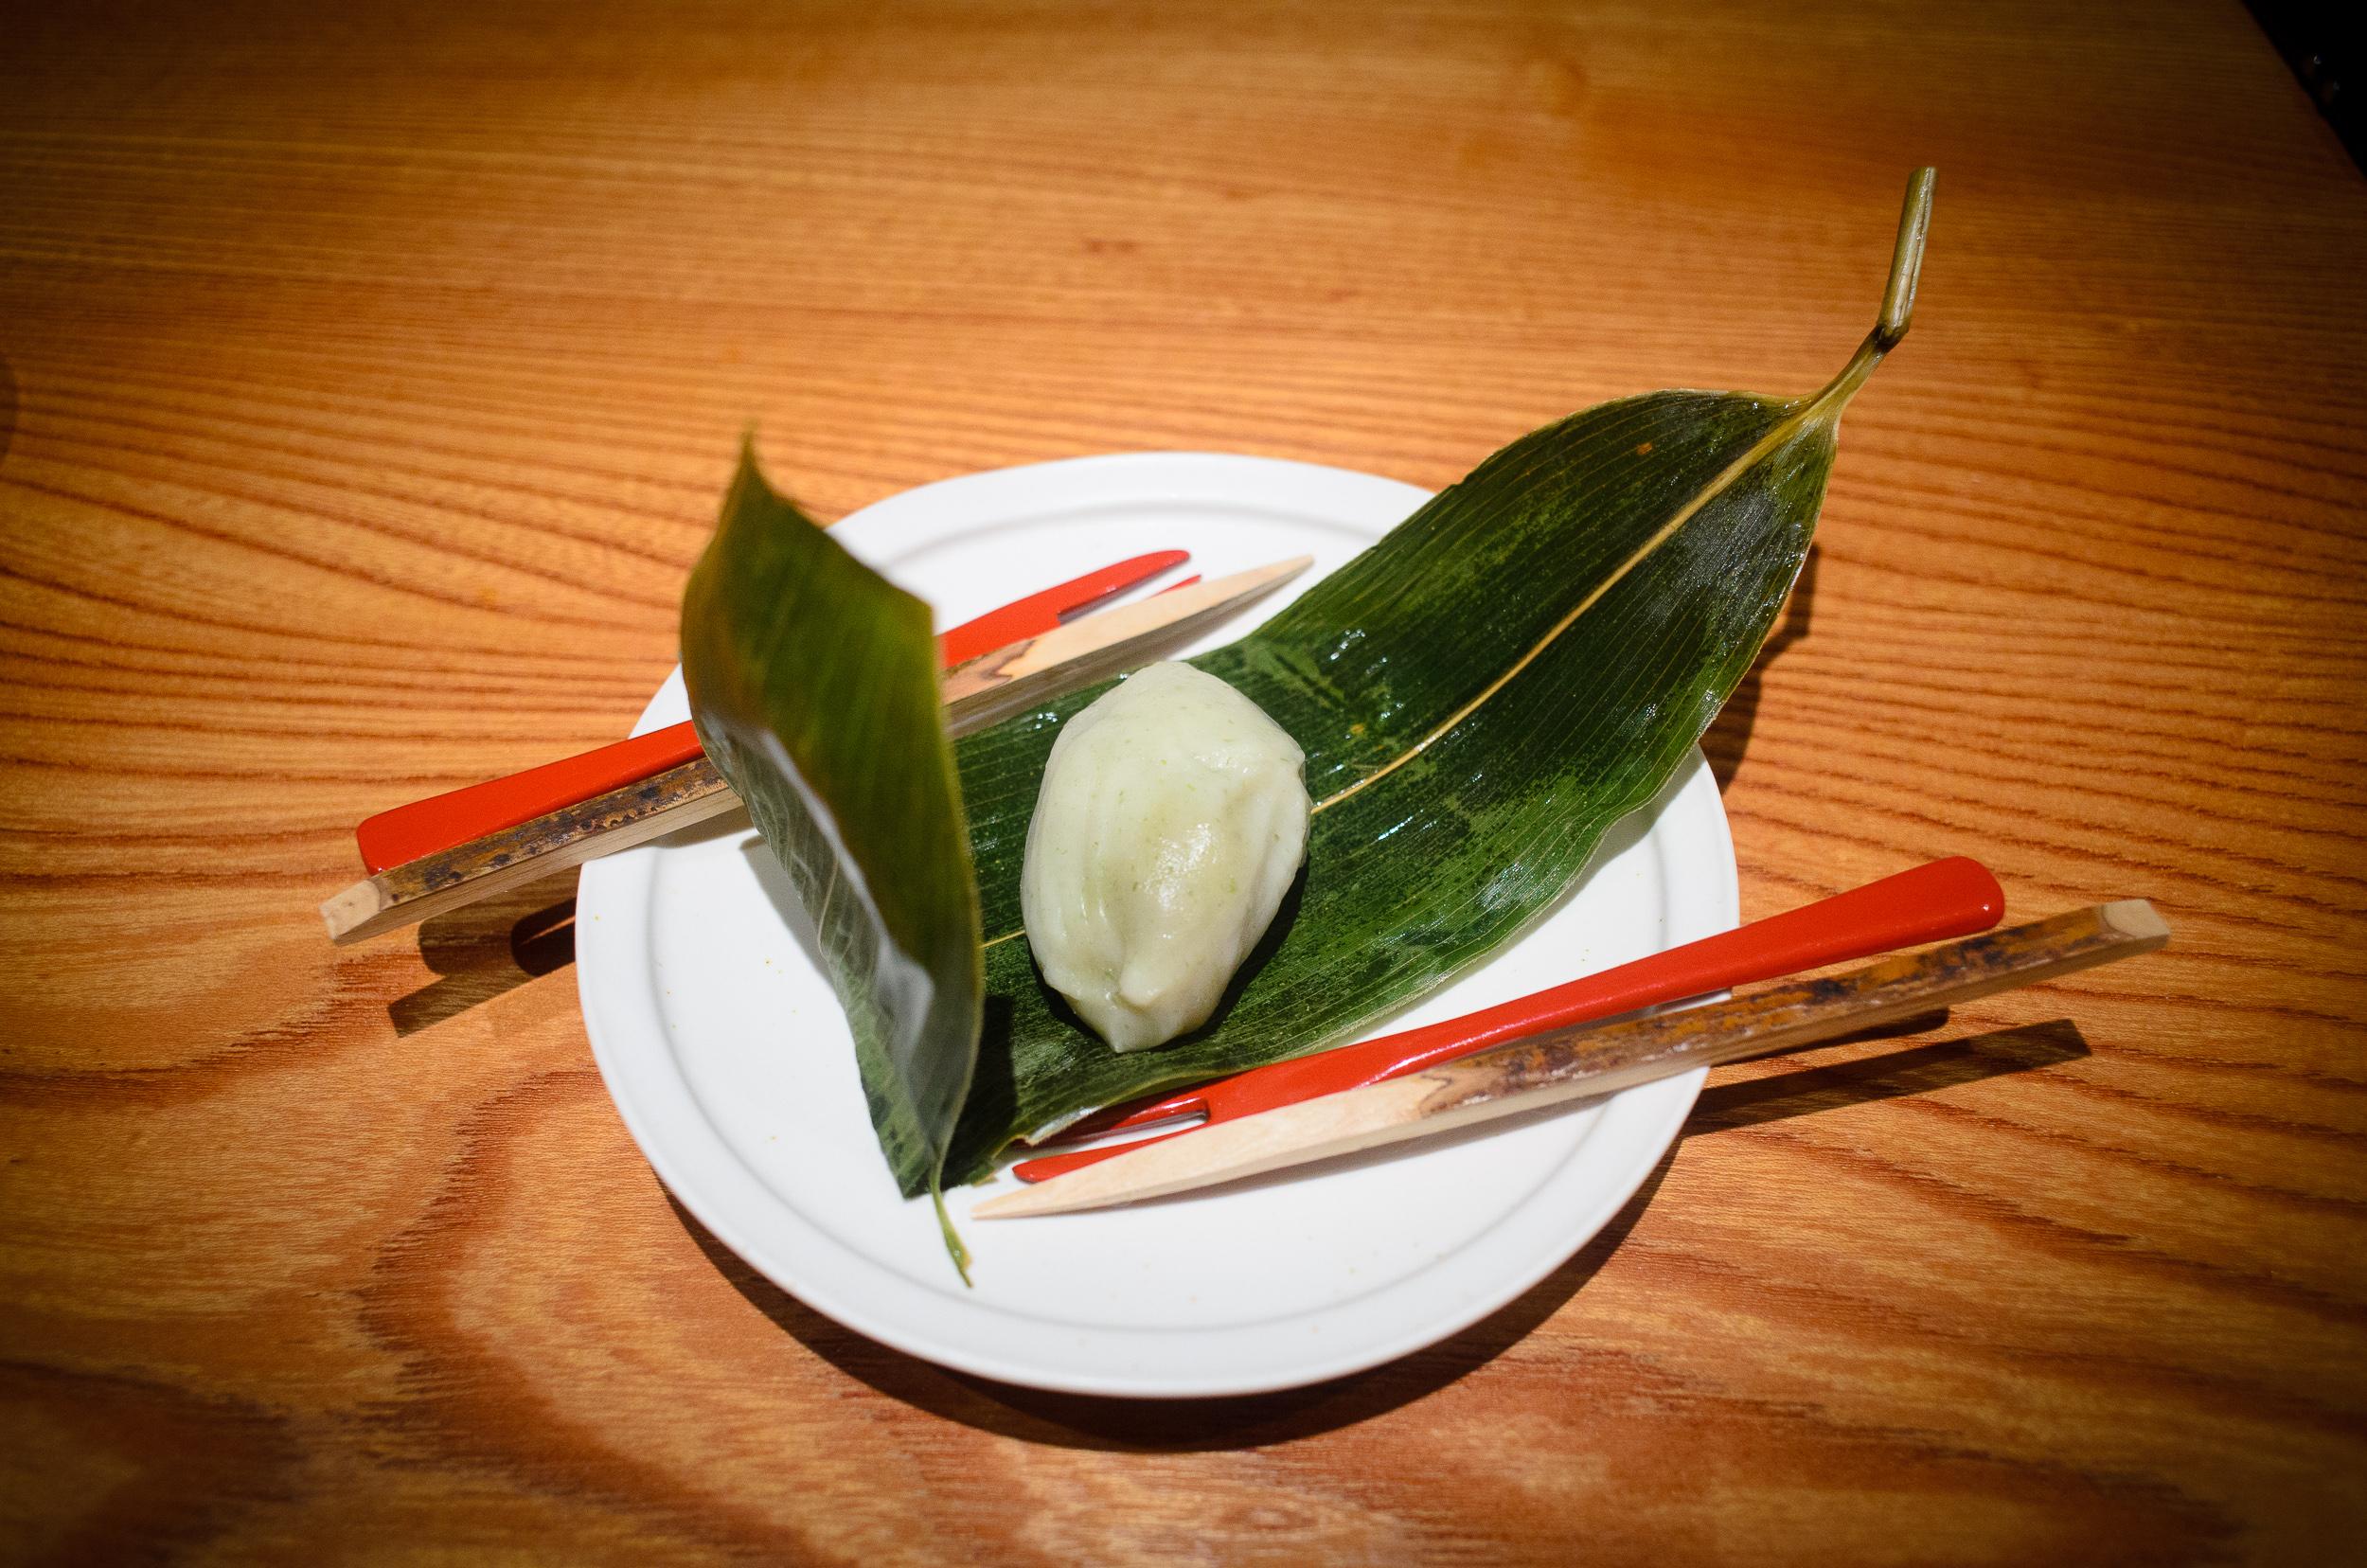 Nama-fu manjyu by FU-KA, open